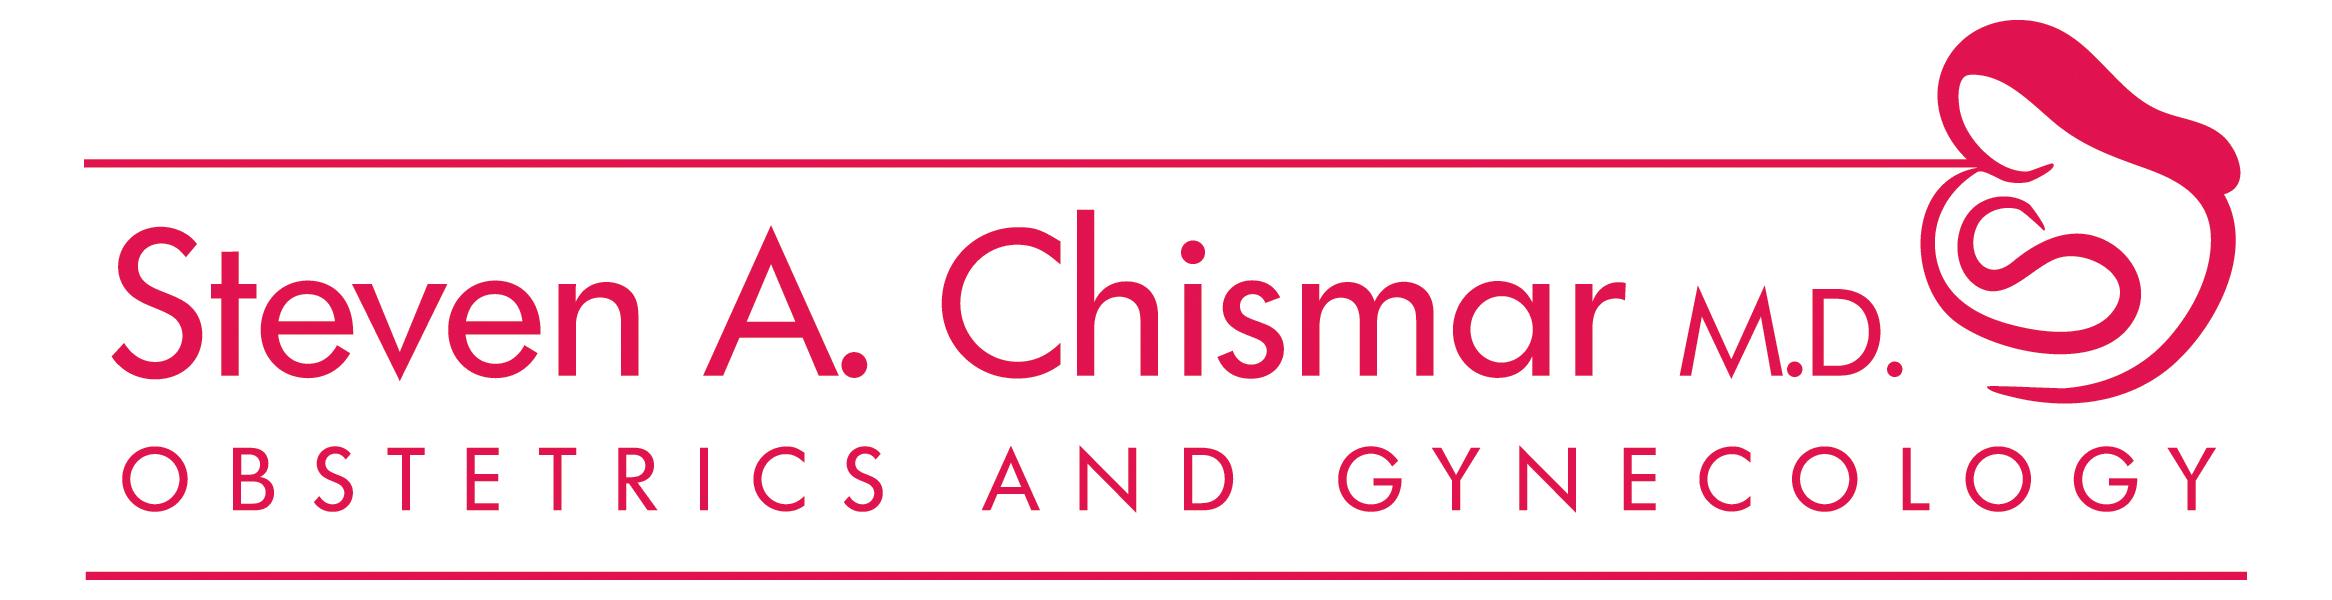 Visit Steven A. Chismar's website